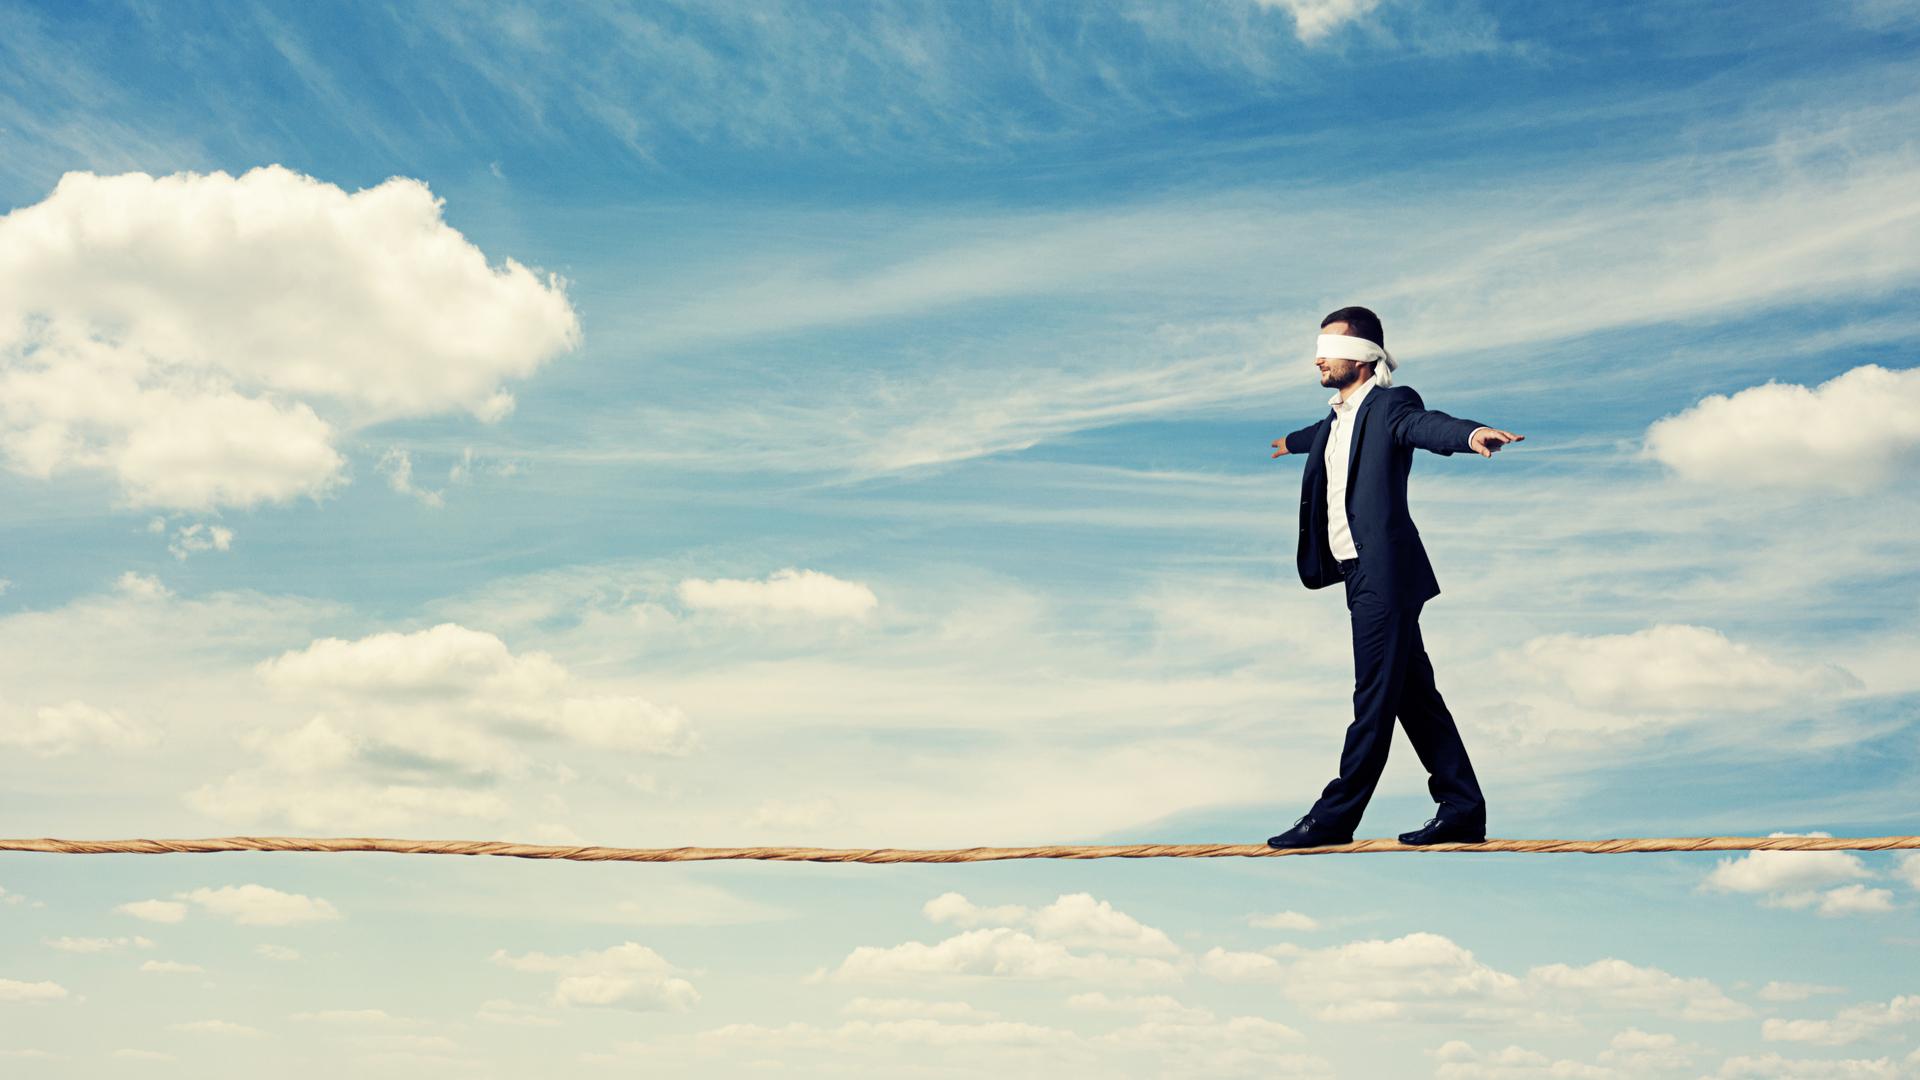 man walking blindfolded on tightrope